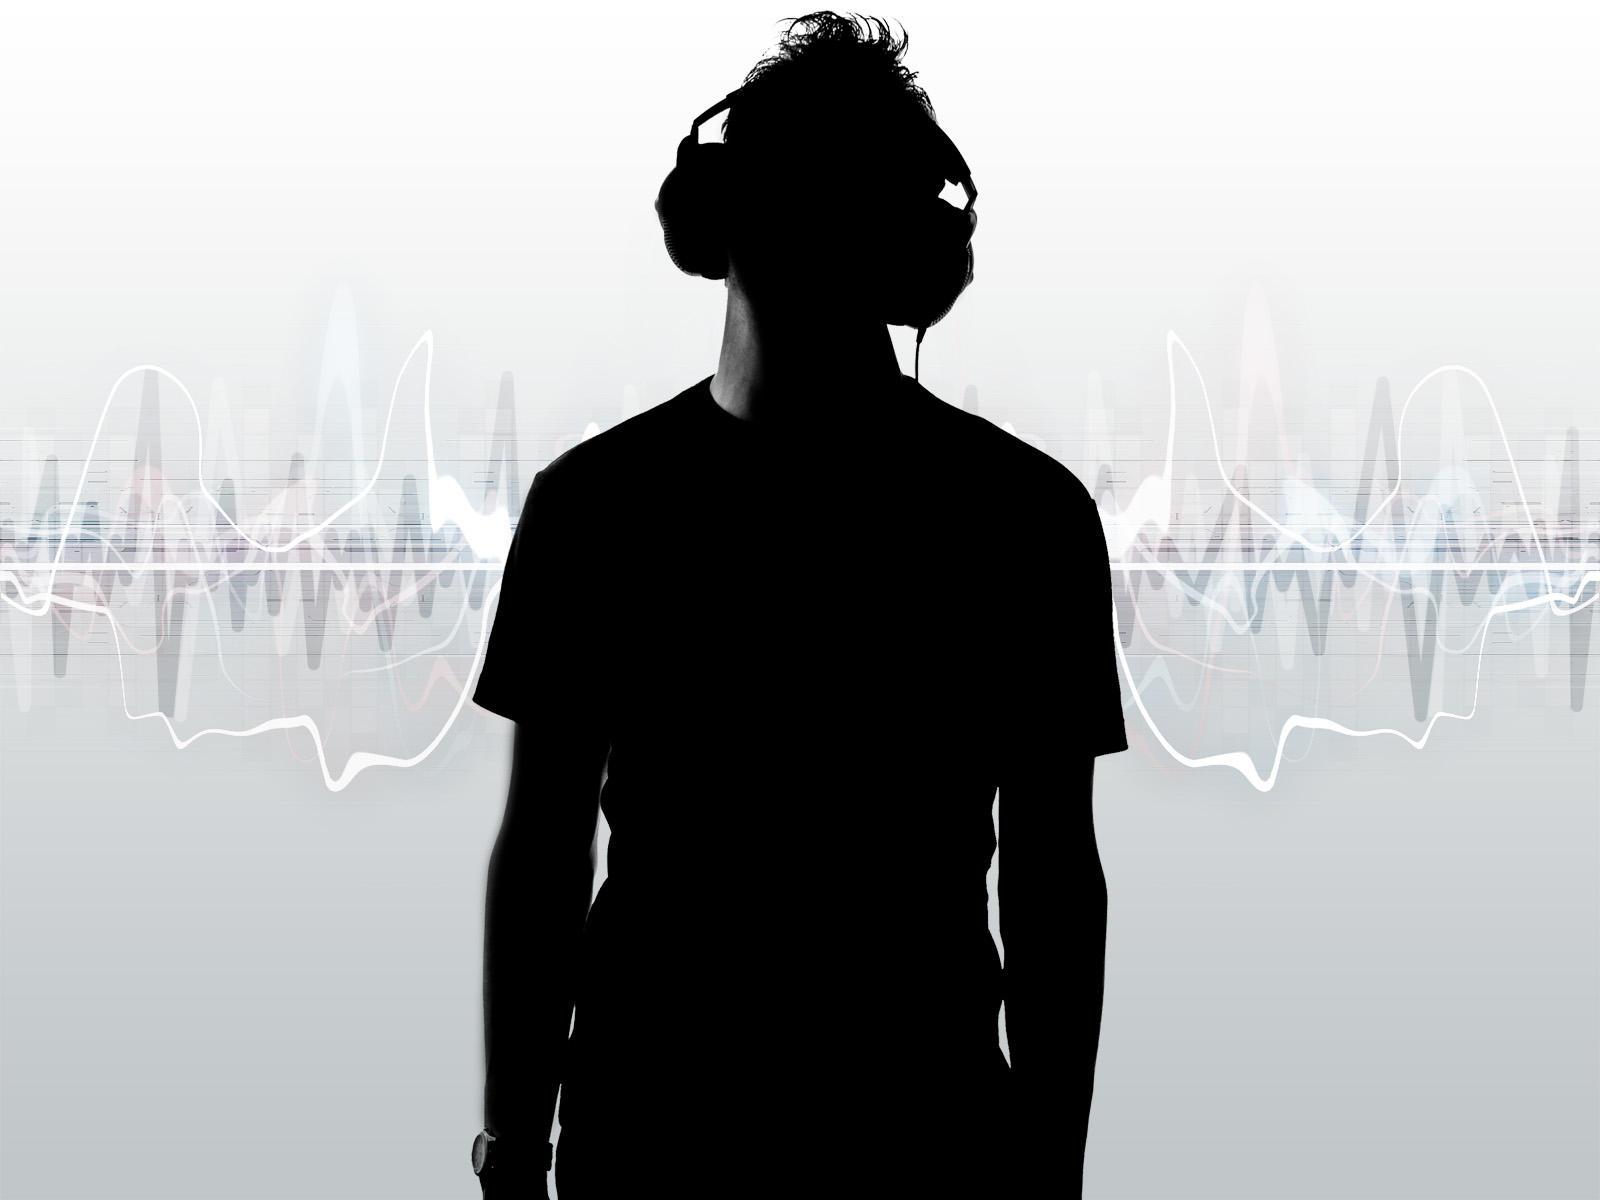 The_Music__by_vhm_alex.jpg